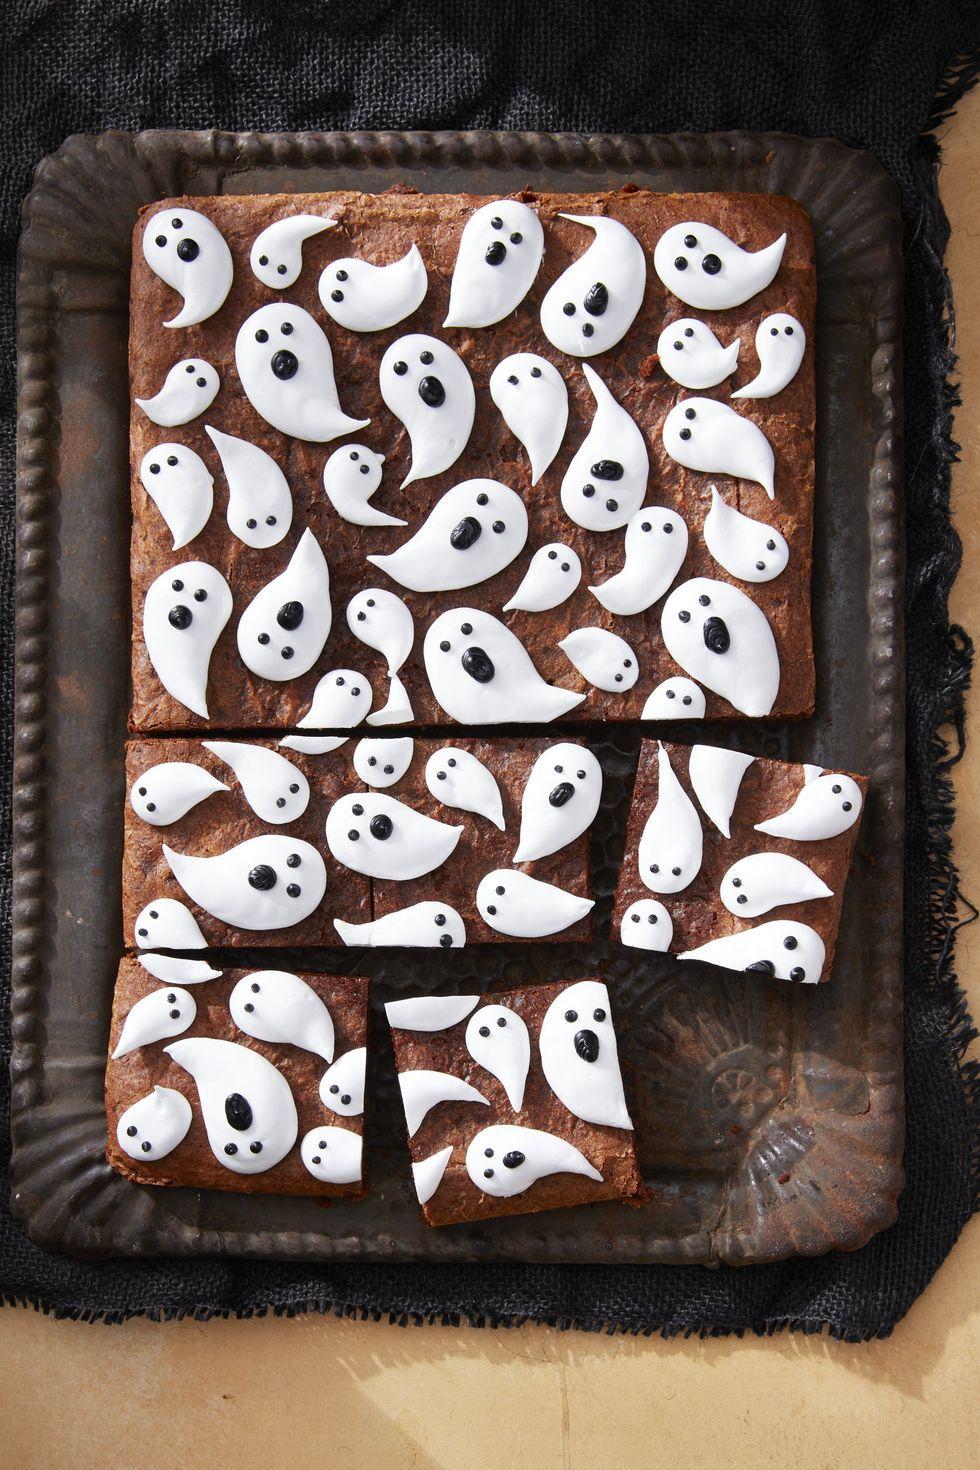 Favorite Halloween Treats.60 Best Halloween Desserts Easy Halloween Dessert Recipes And Ideas